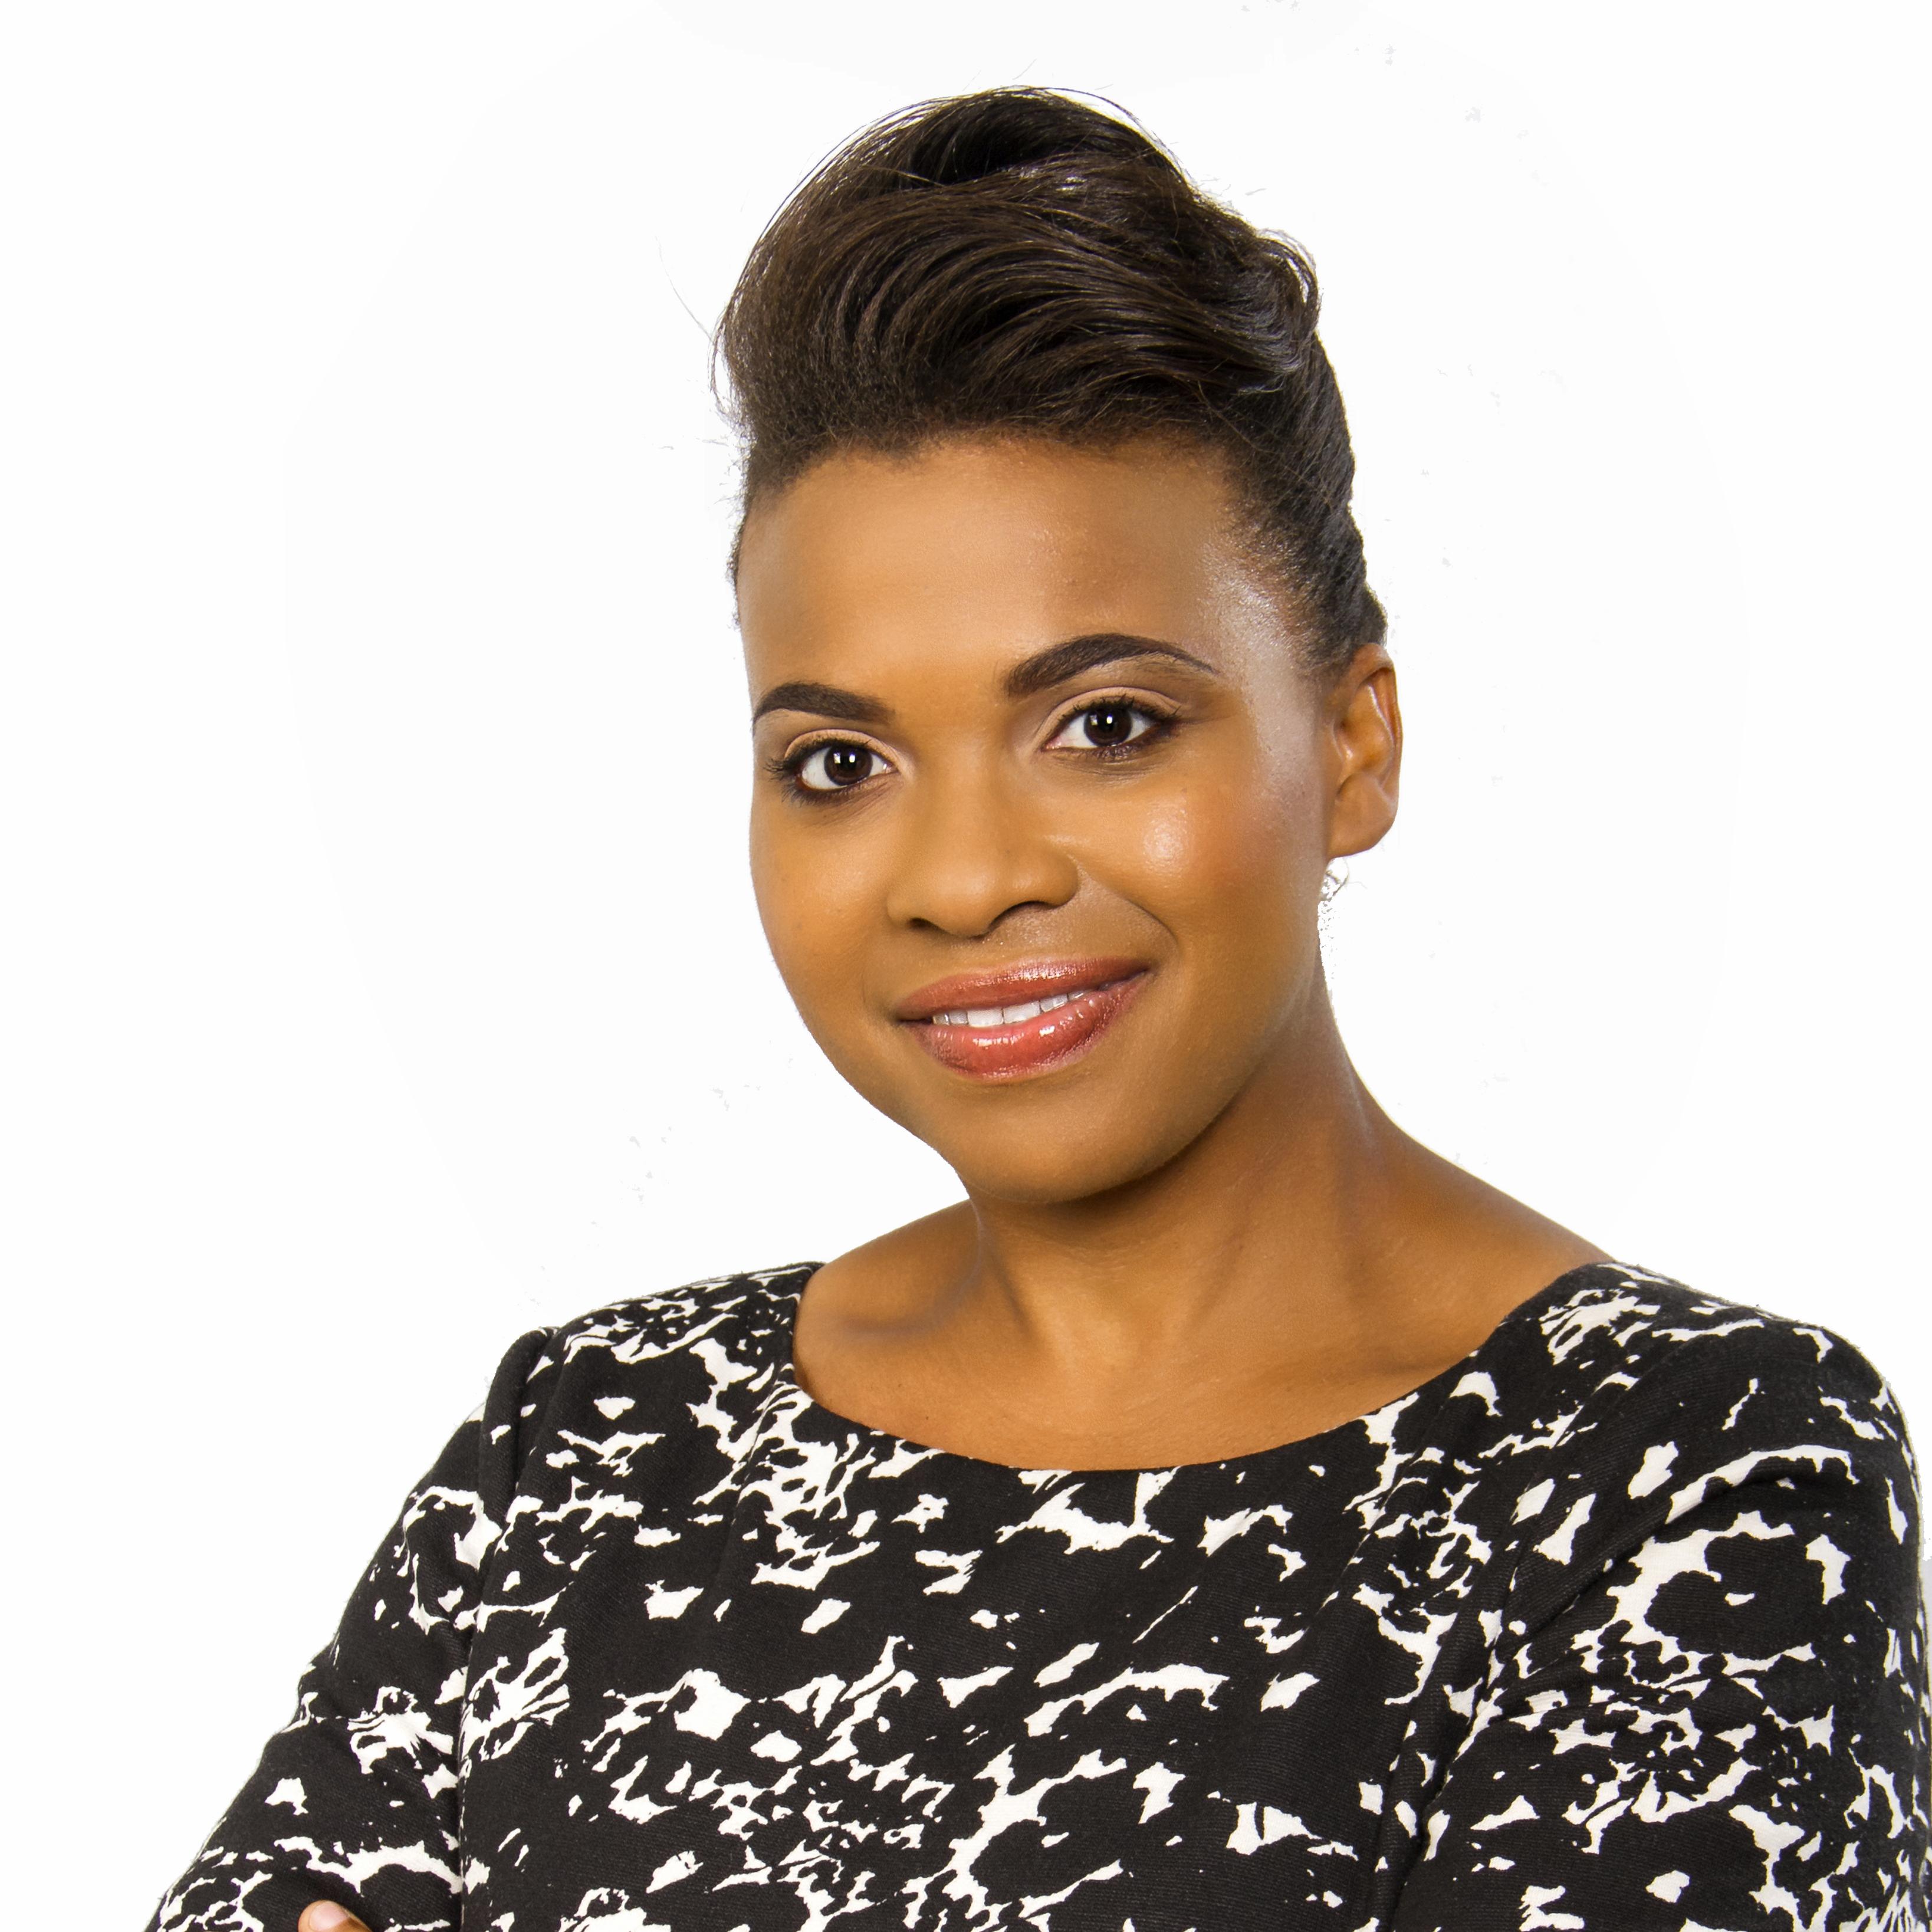 Dr. Stephanie Hayden-Adeyemo